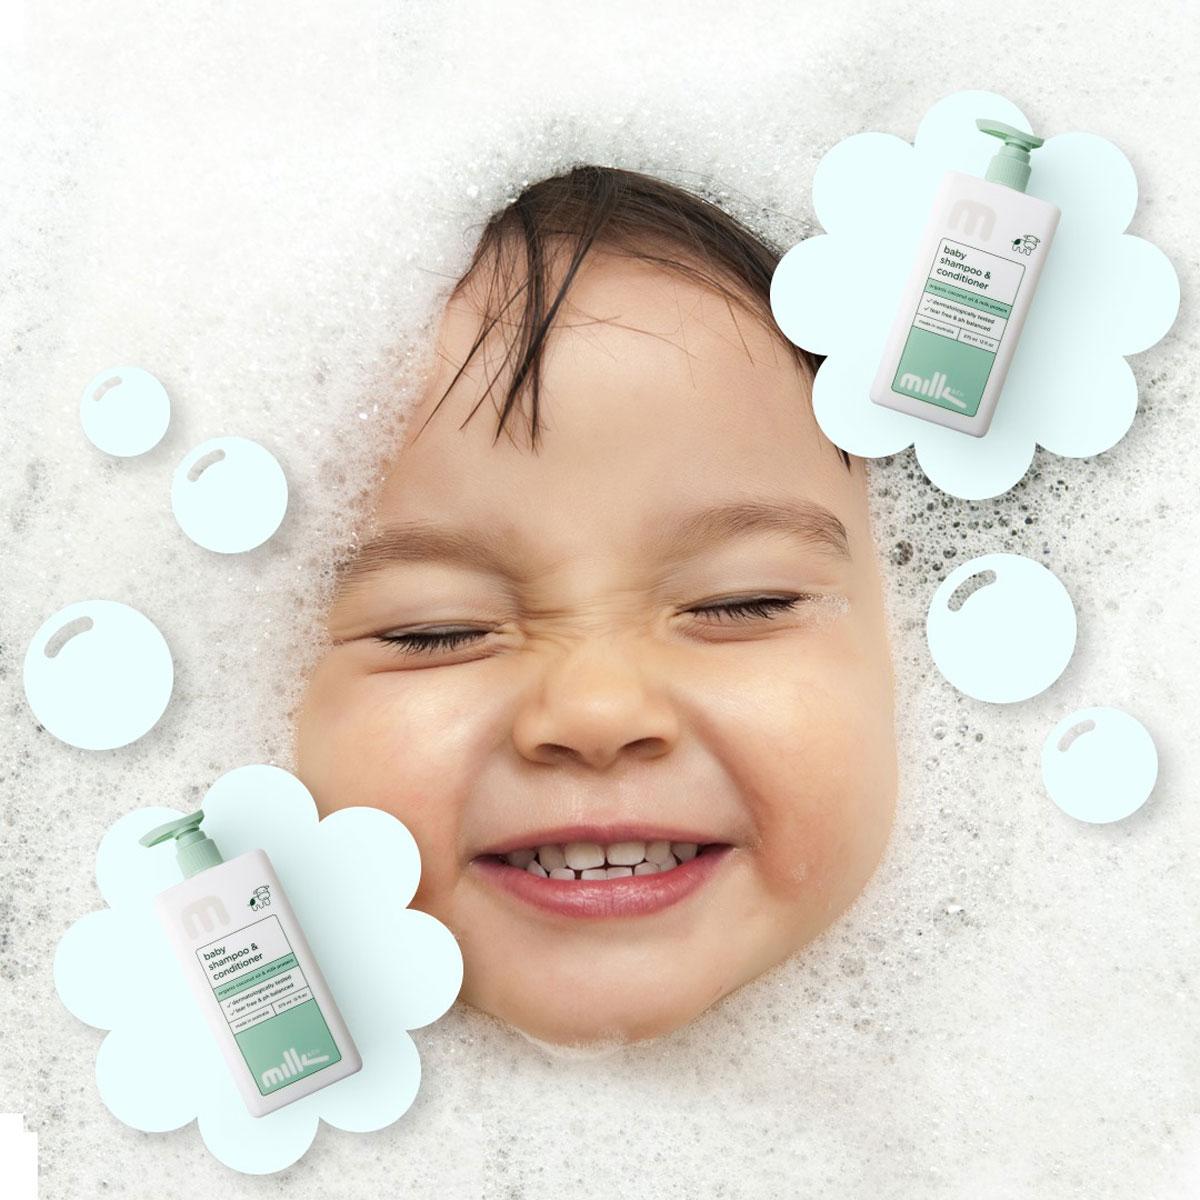 Milk & Co Baby Shampoo & Conditioner 375mL